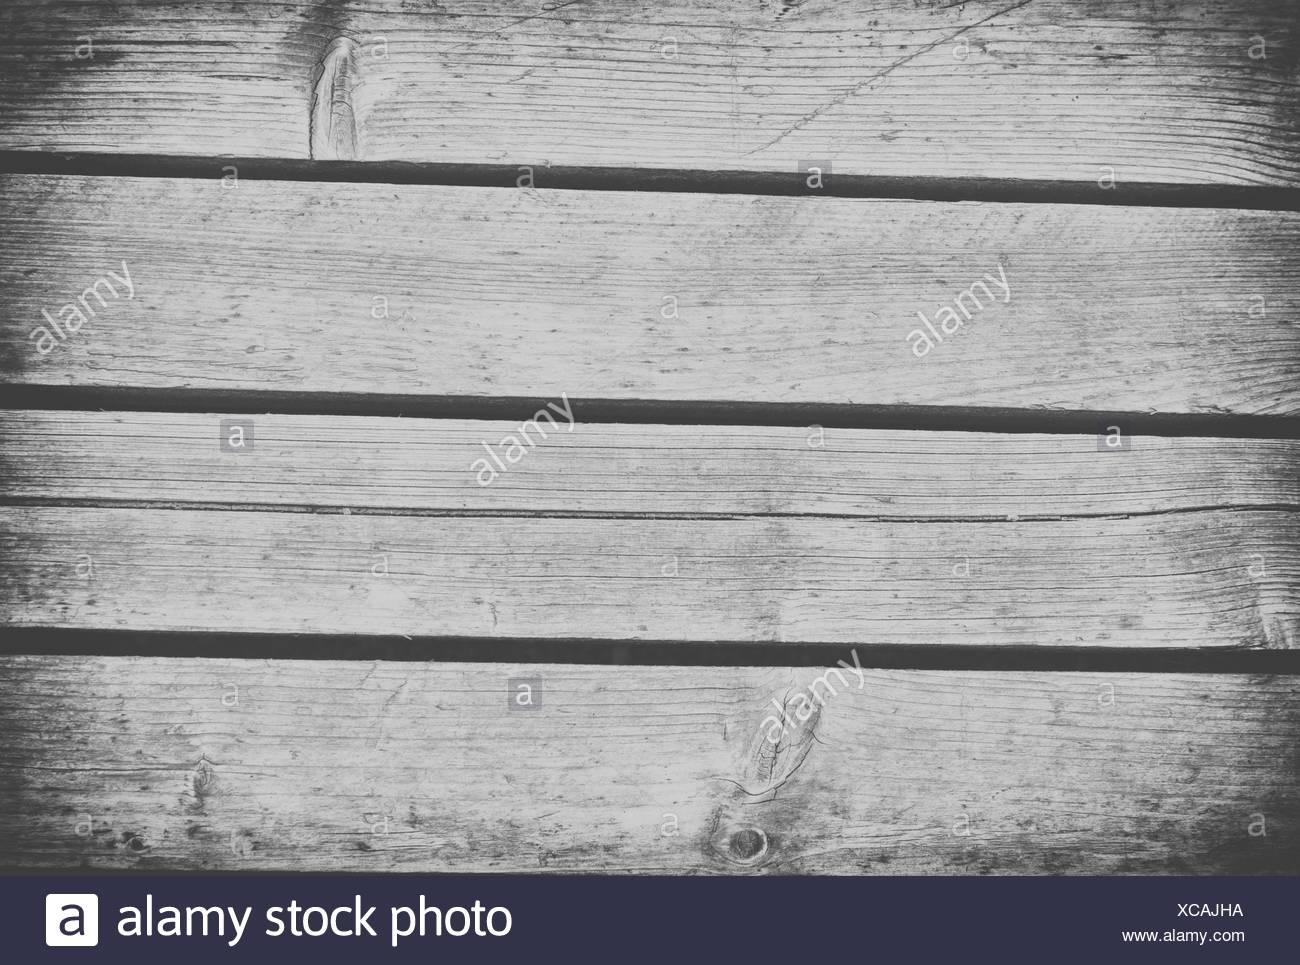 black and white wood texture or bakcground - Stock Image